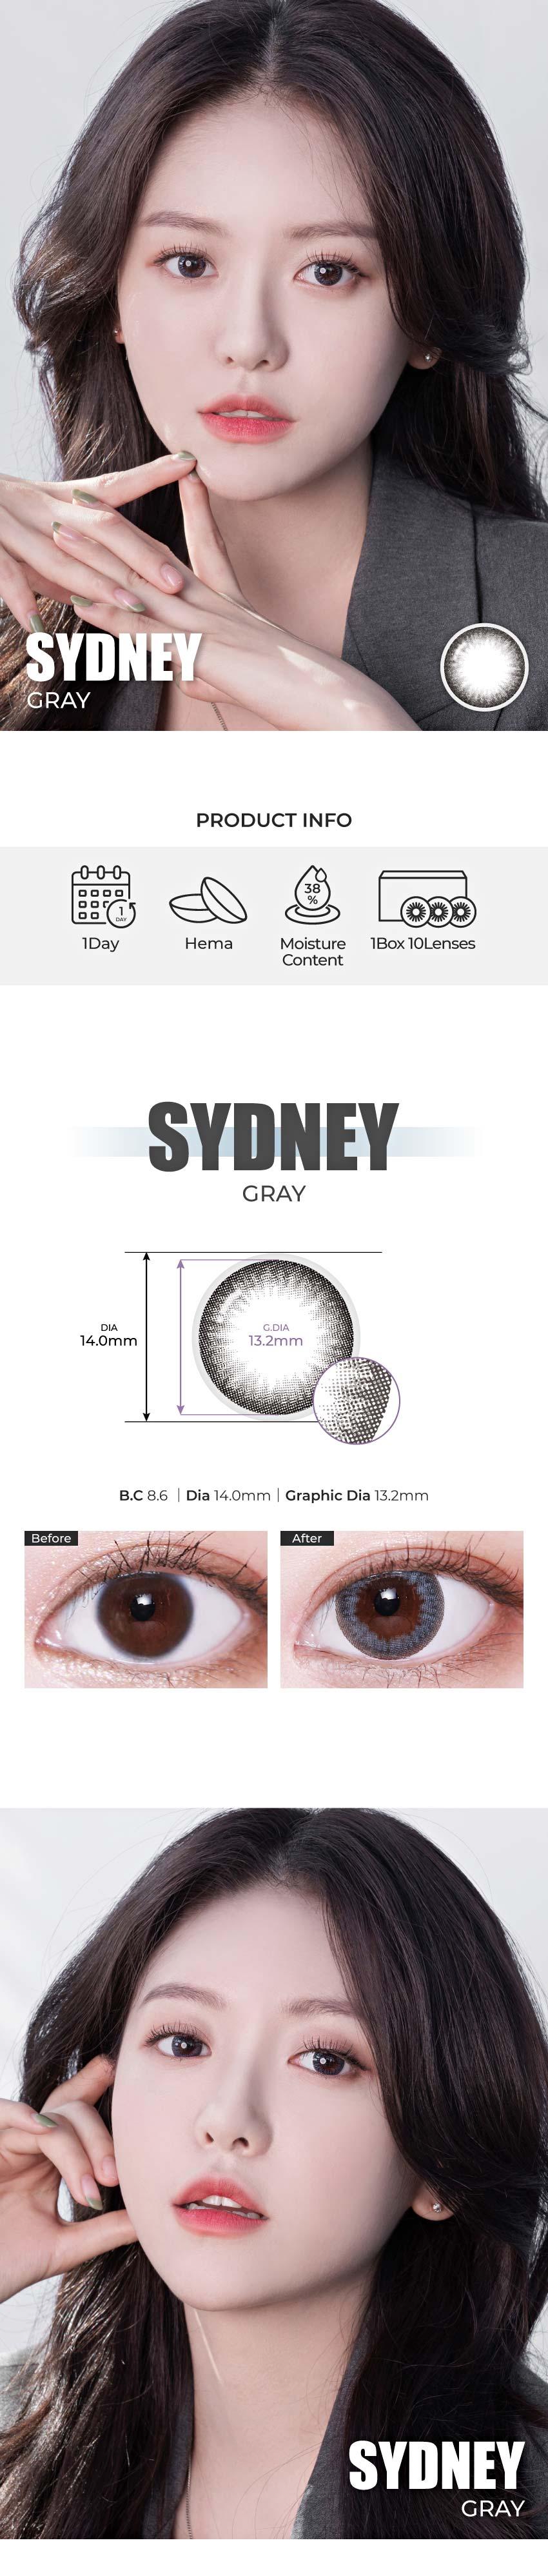 sydney-grayen1.jpg